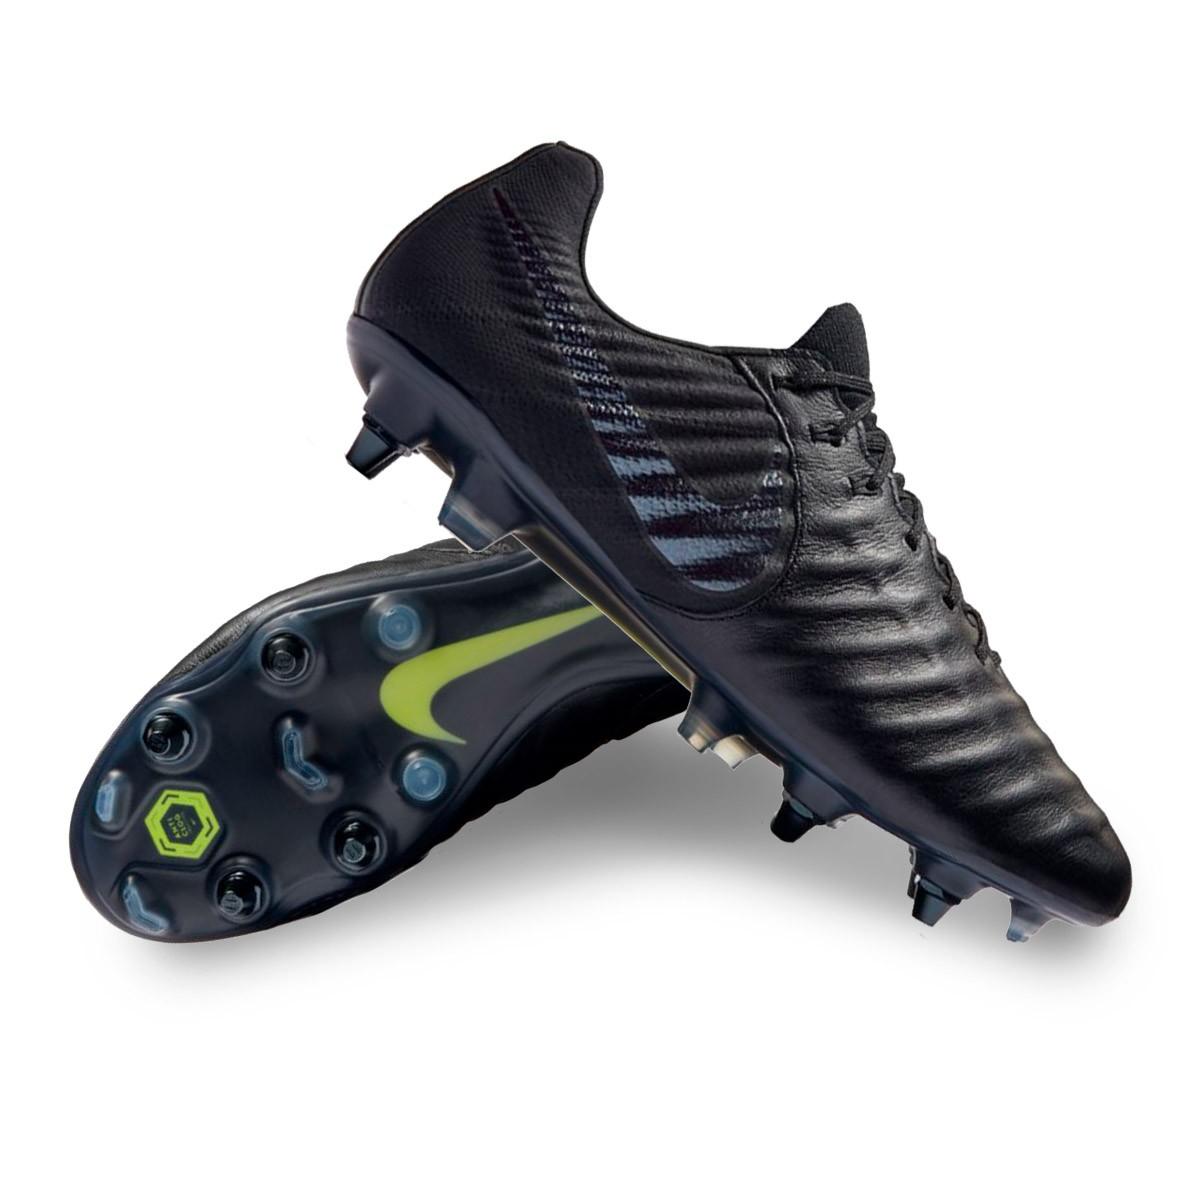 d2e54d0f1 Football Boots Nike Tiempo Legend VII Elite Anti-Clog SG-Pro Black ...